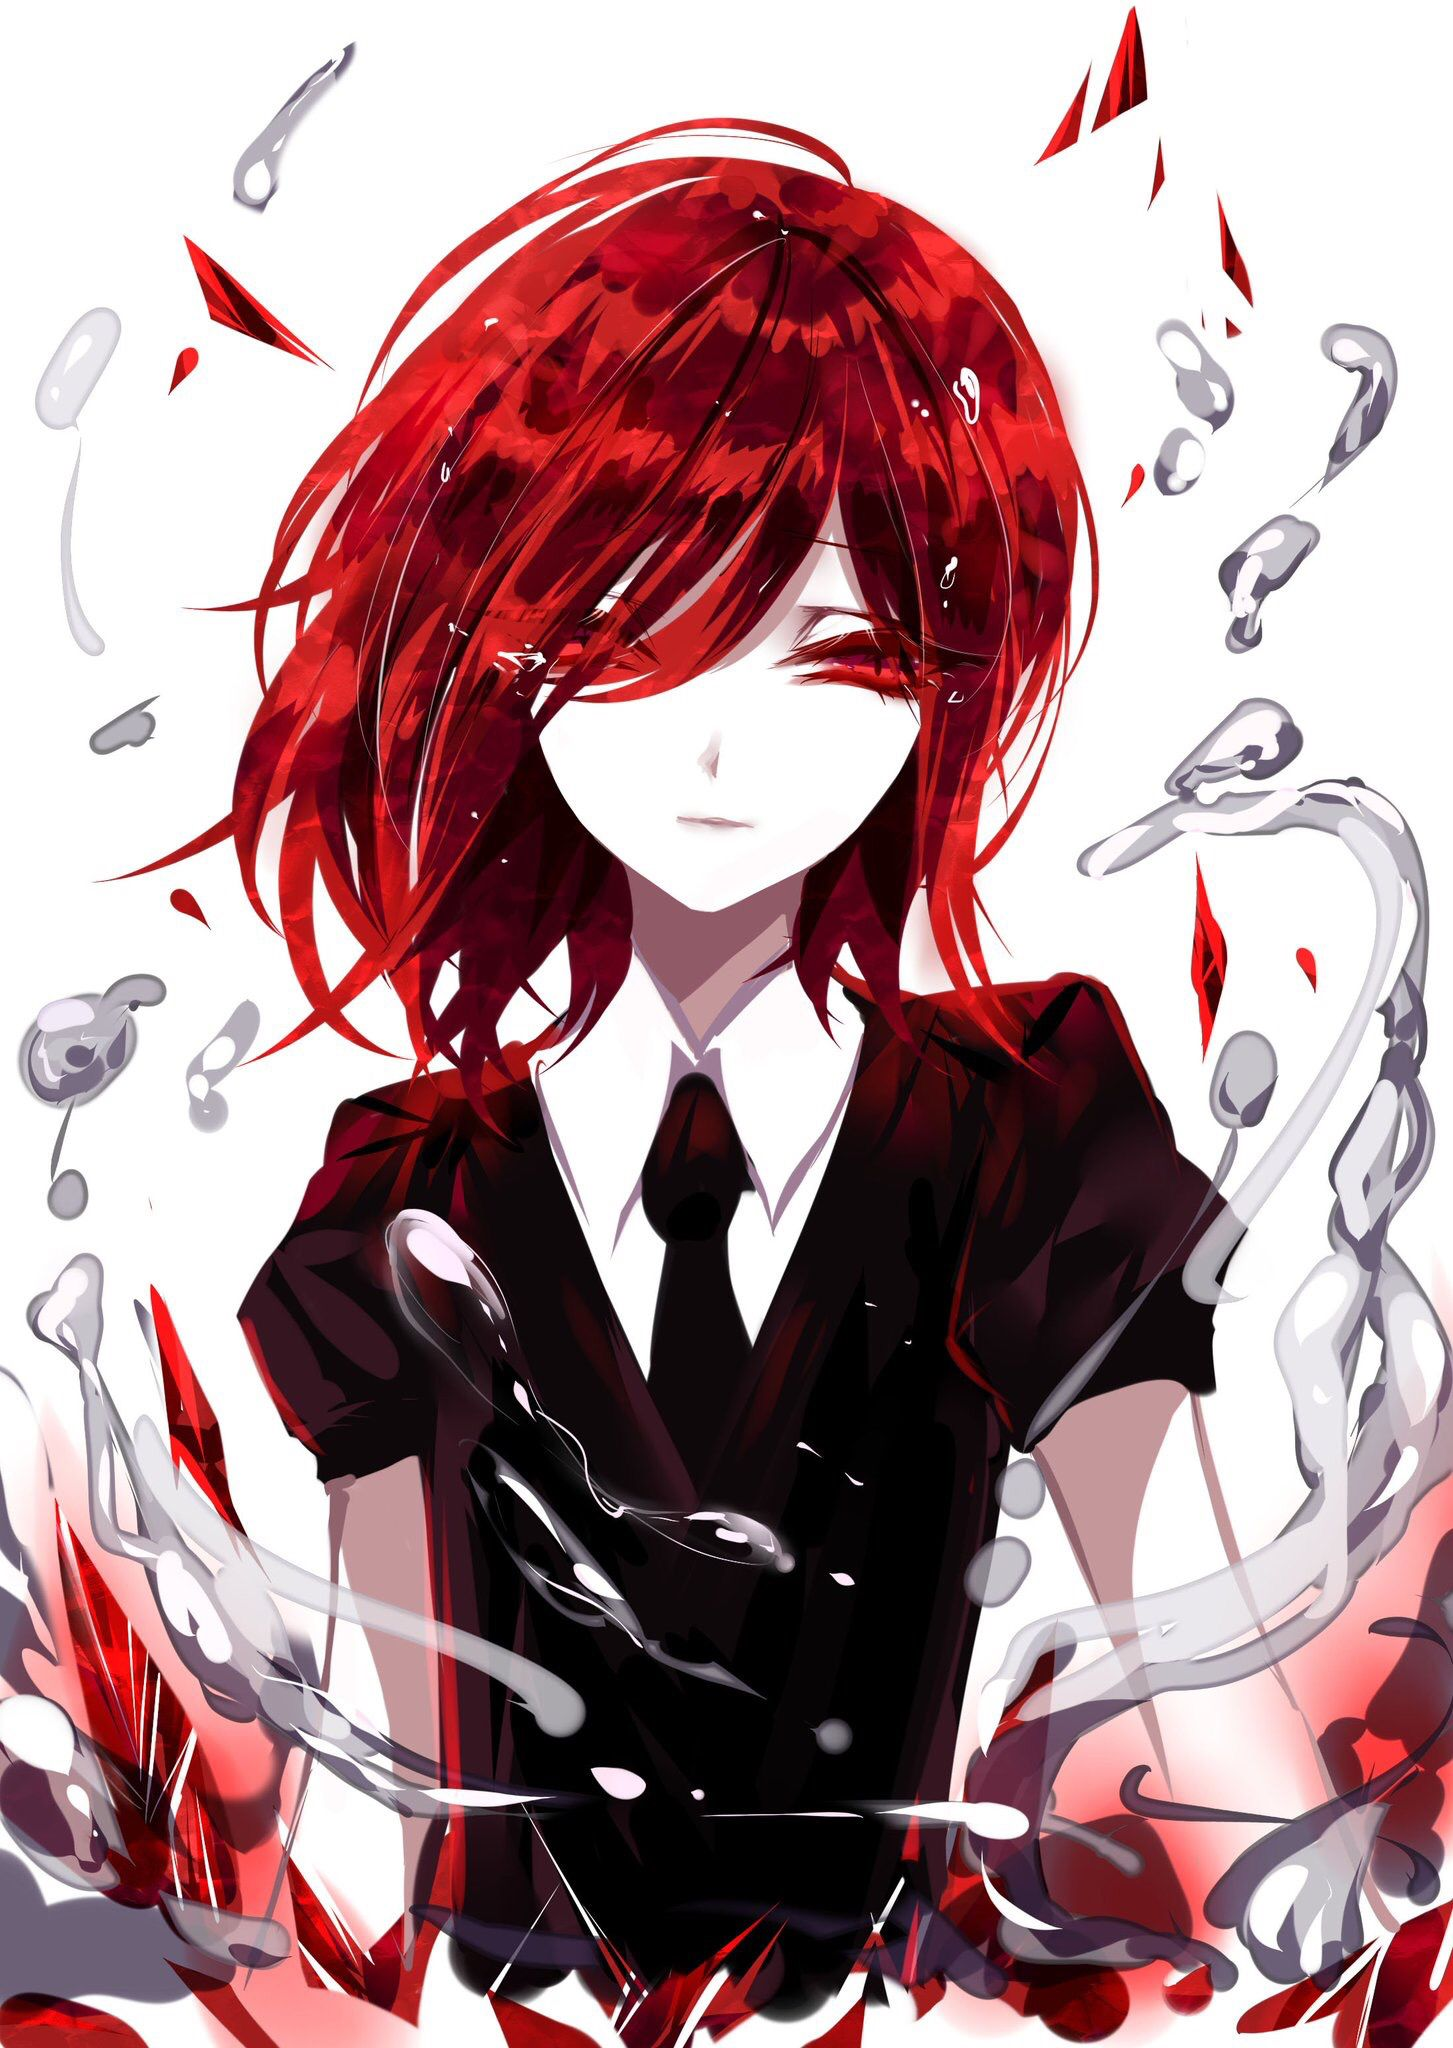 Artist Sheya Anime Art Beautiful Anime Anime Nerd